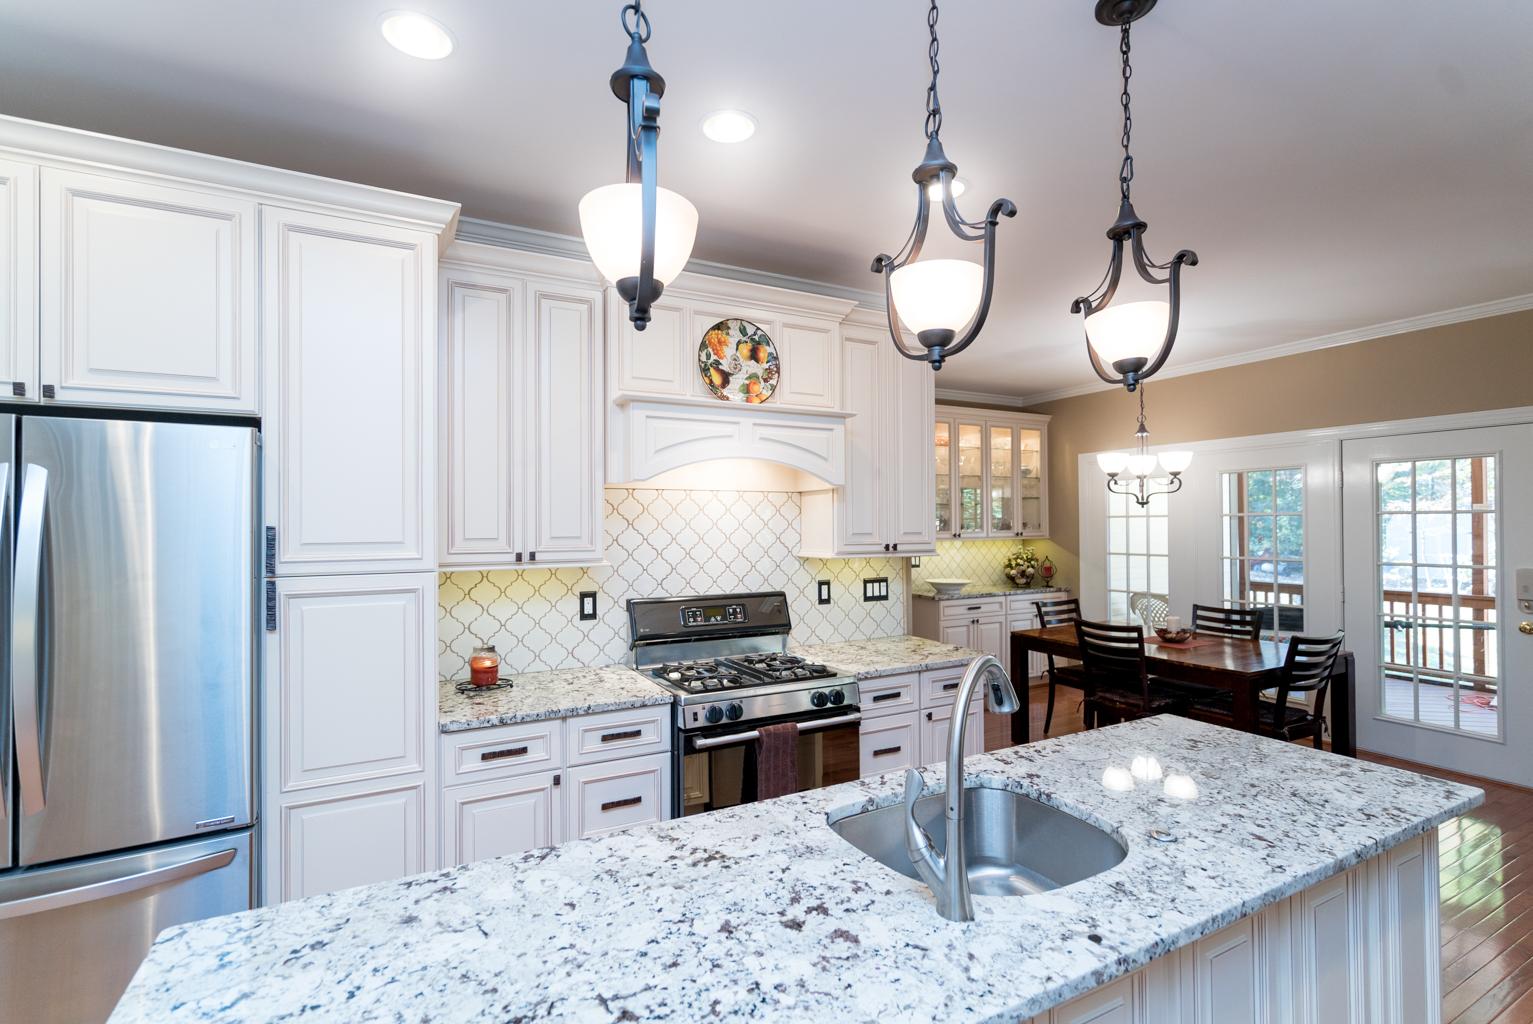 Kitchen Remodeling Project 4 - POTOMAC KITCHEN AND BATH LLC